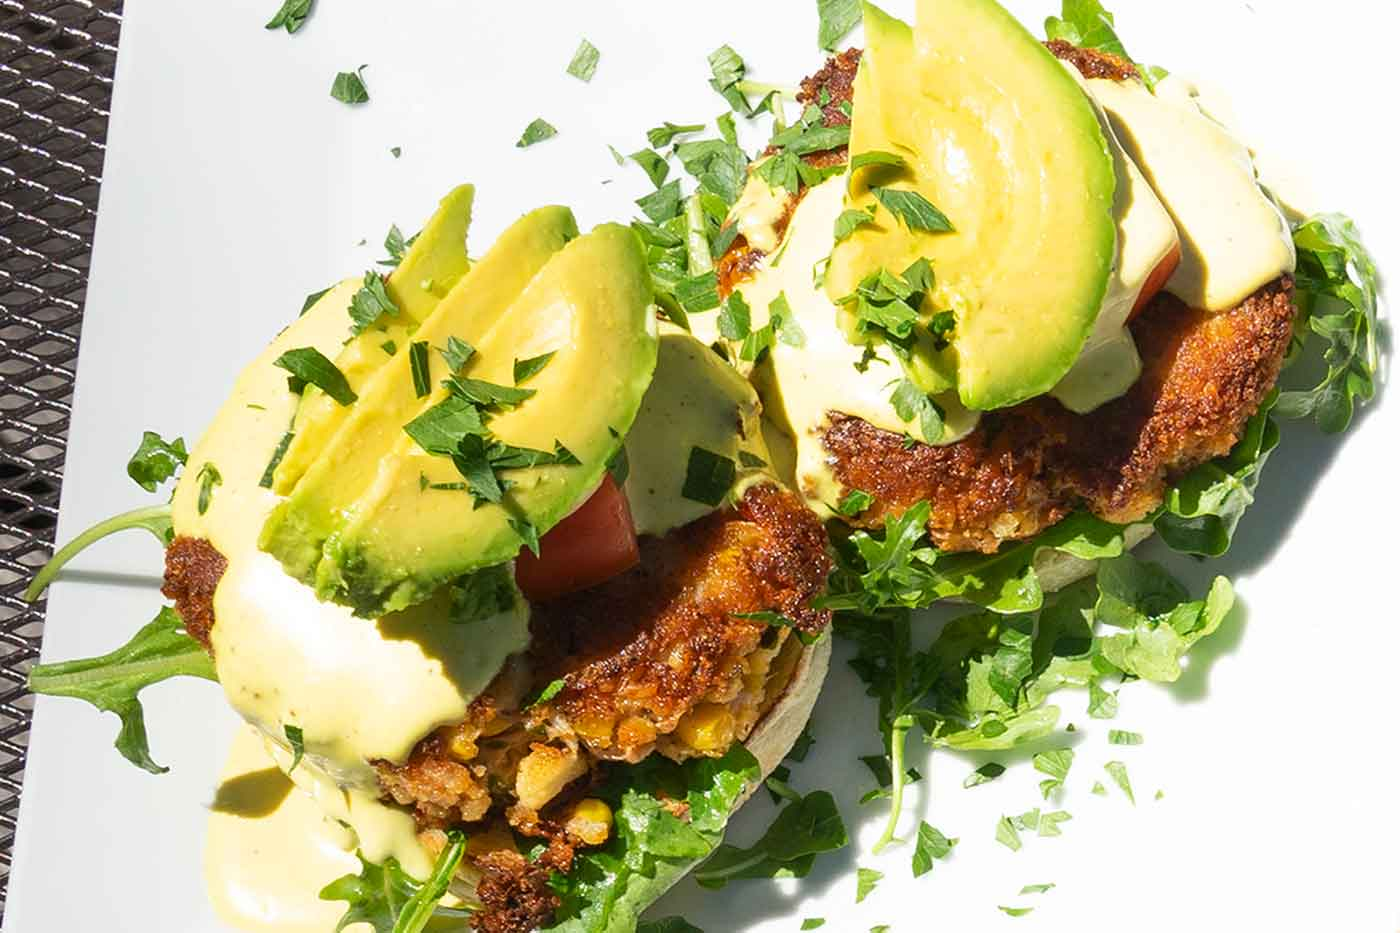 vegan eggs Benedict crab cakes from Plant Food Supper Club in Idyllwild California